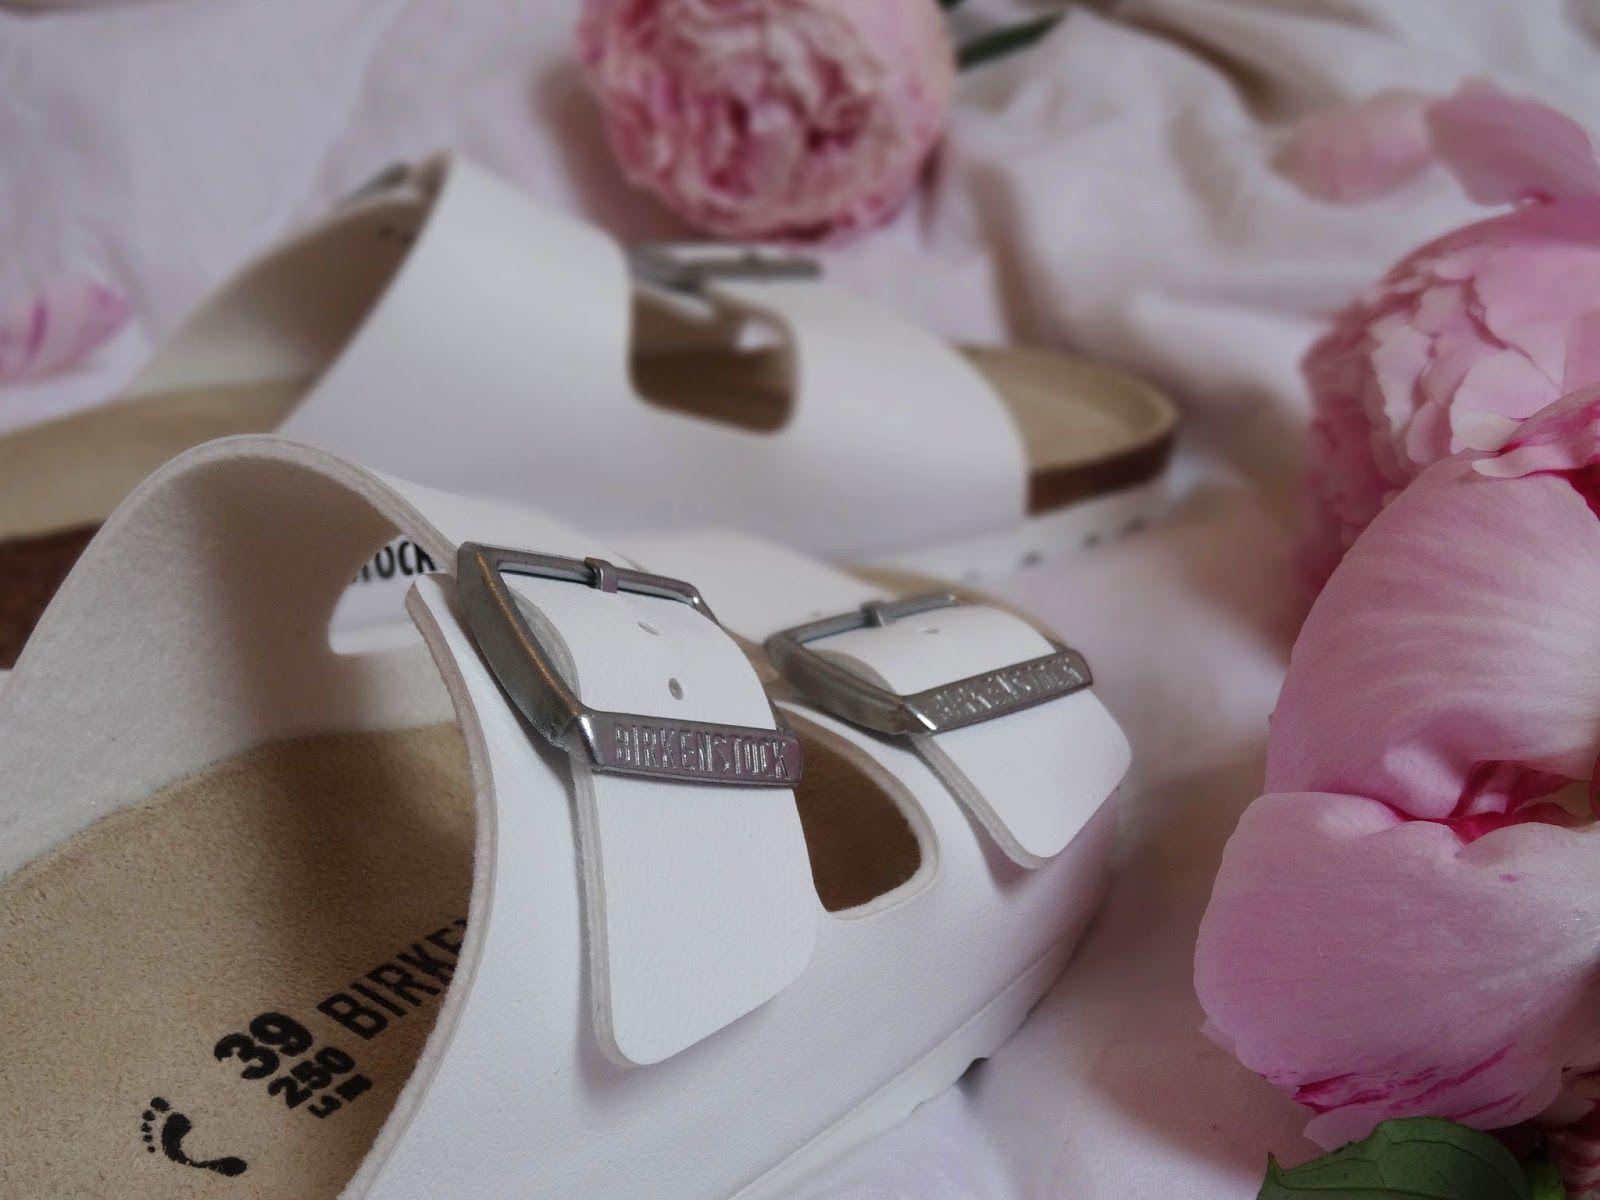 BIRKENSTOCK Arizonas #fashion #birkenstock #summer #white #flowers #pink #fblogger #fashionblogger #blogger #blogpost